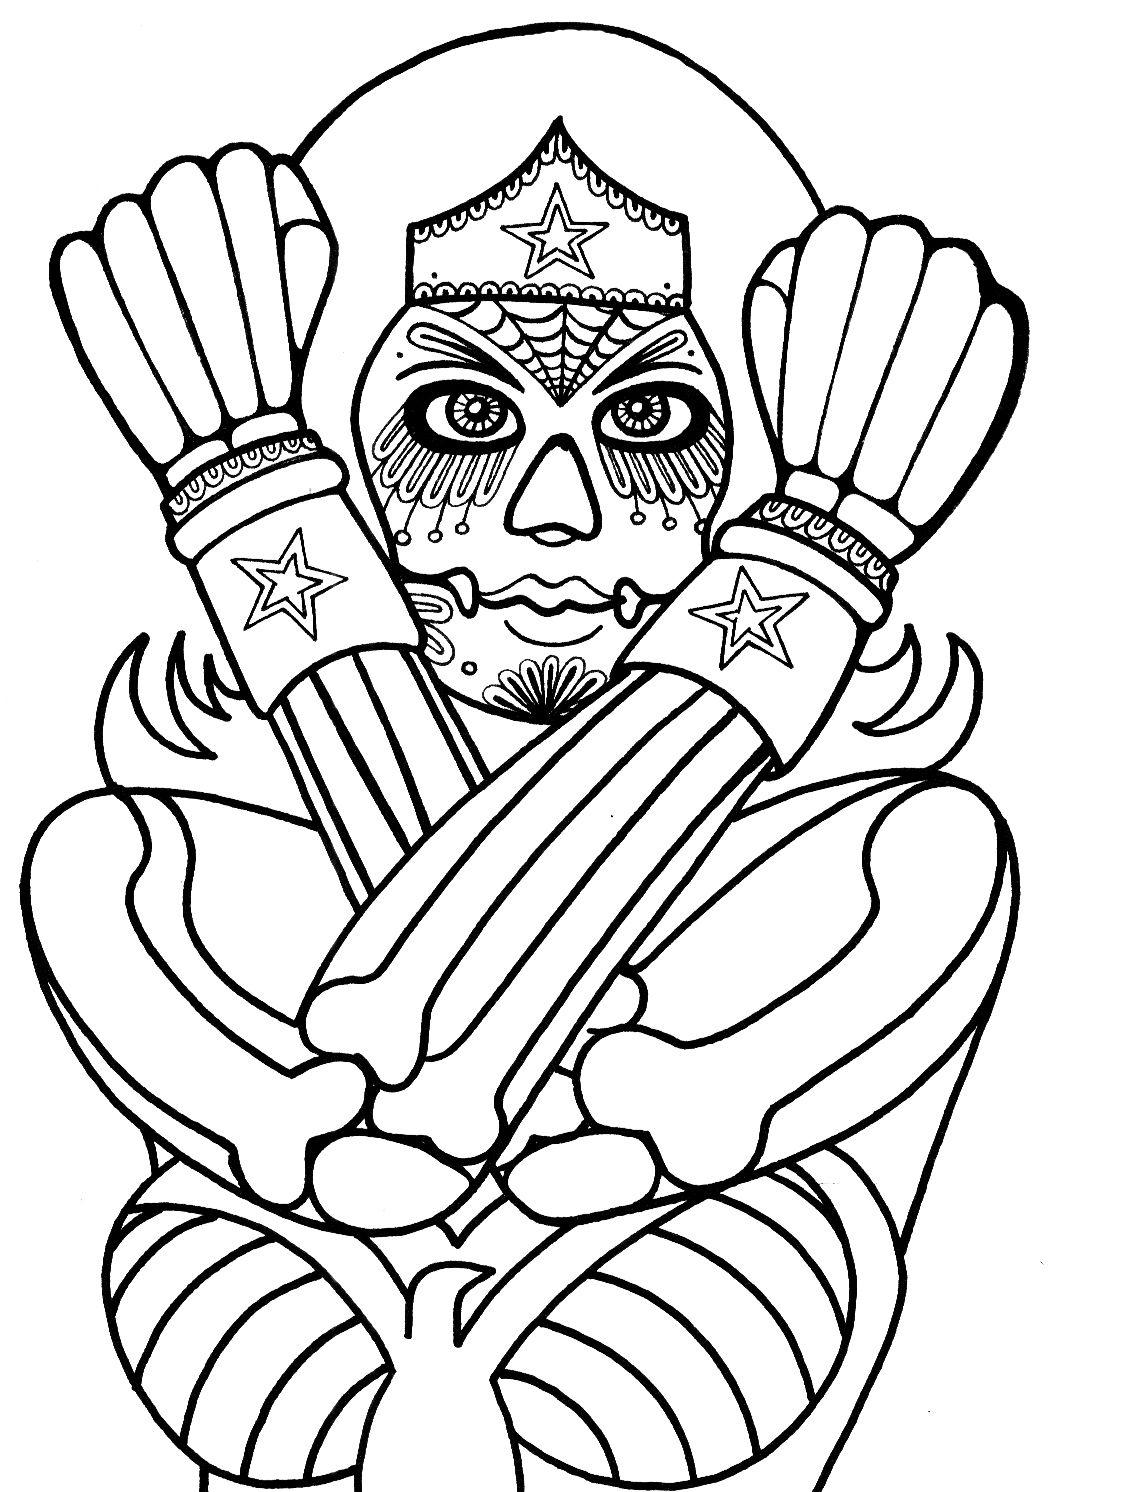 Dia De Los Muertos Coloring Pages | Wenchkin\'s coloring pages - Dia ...